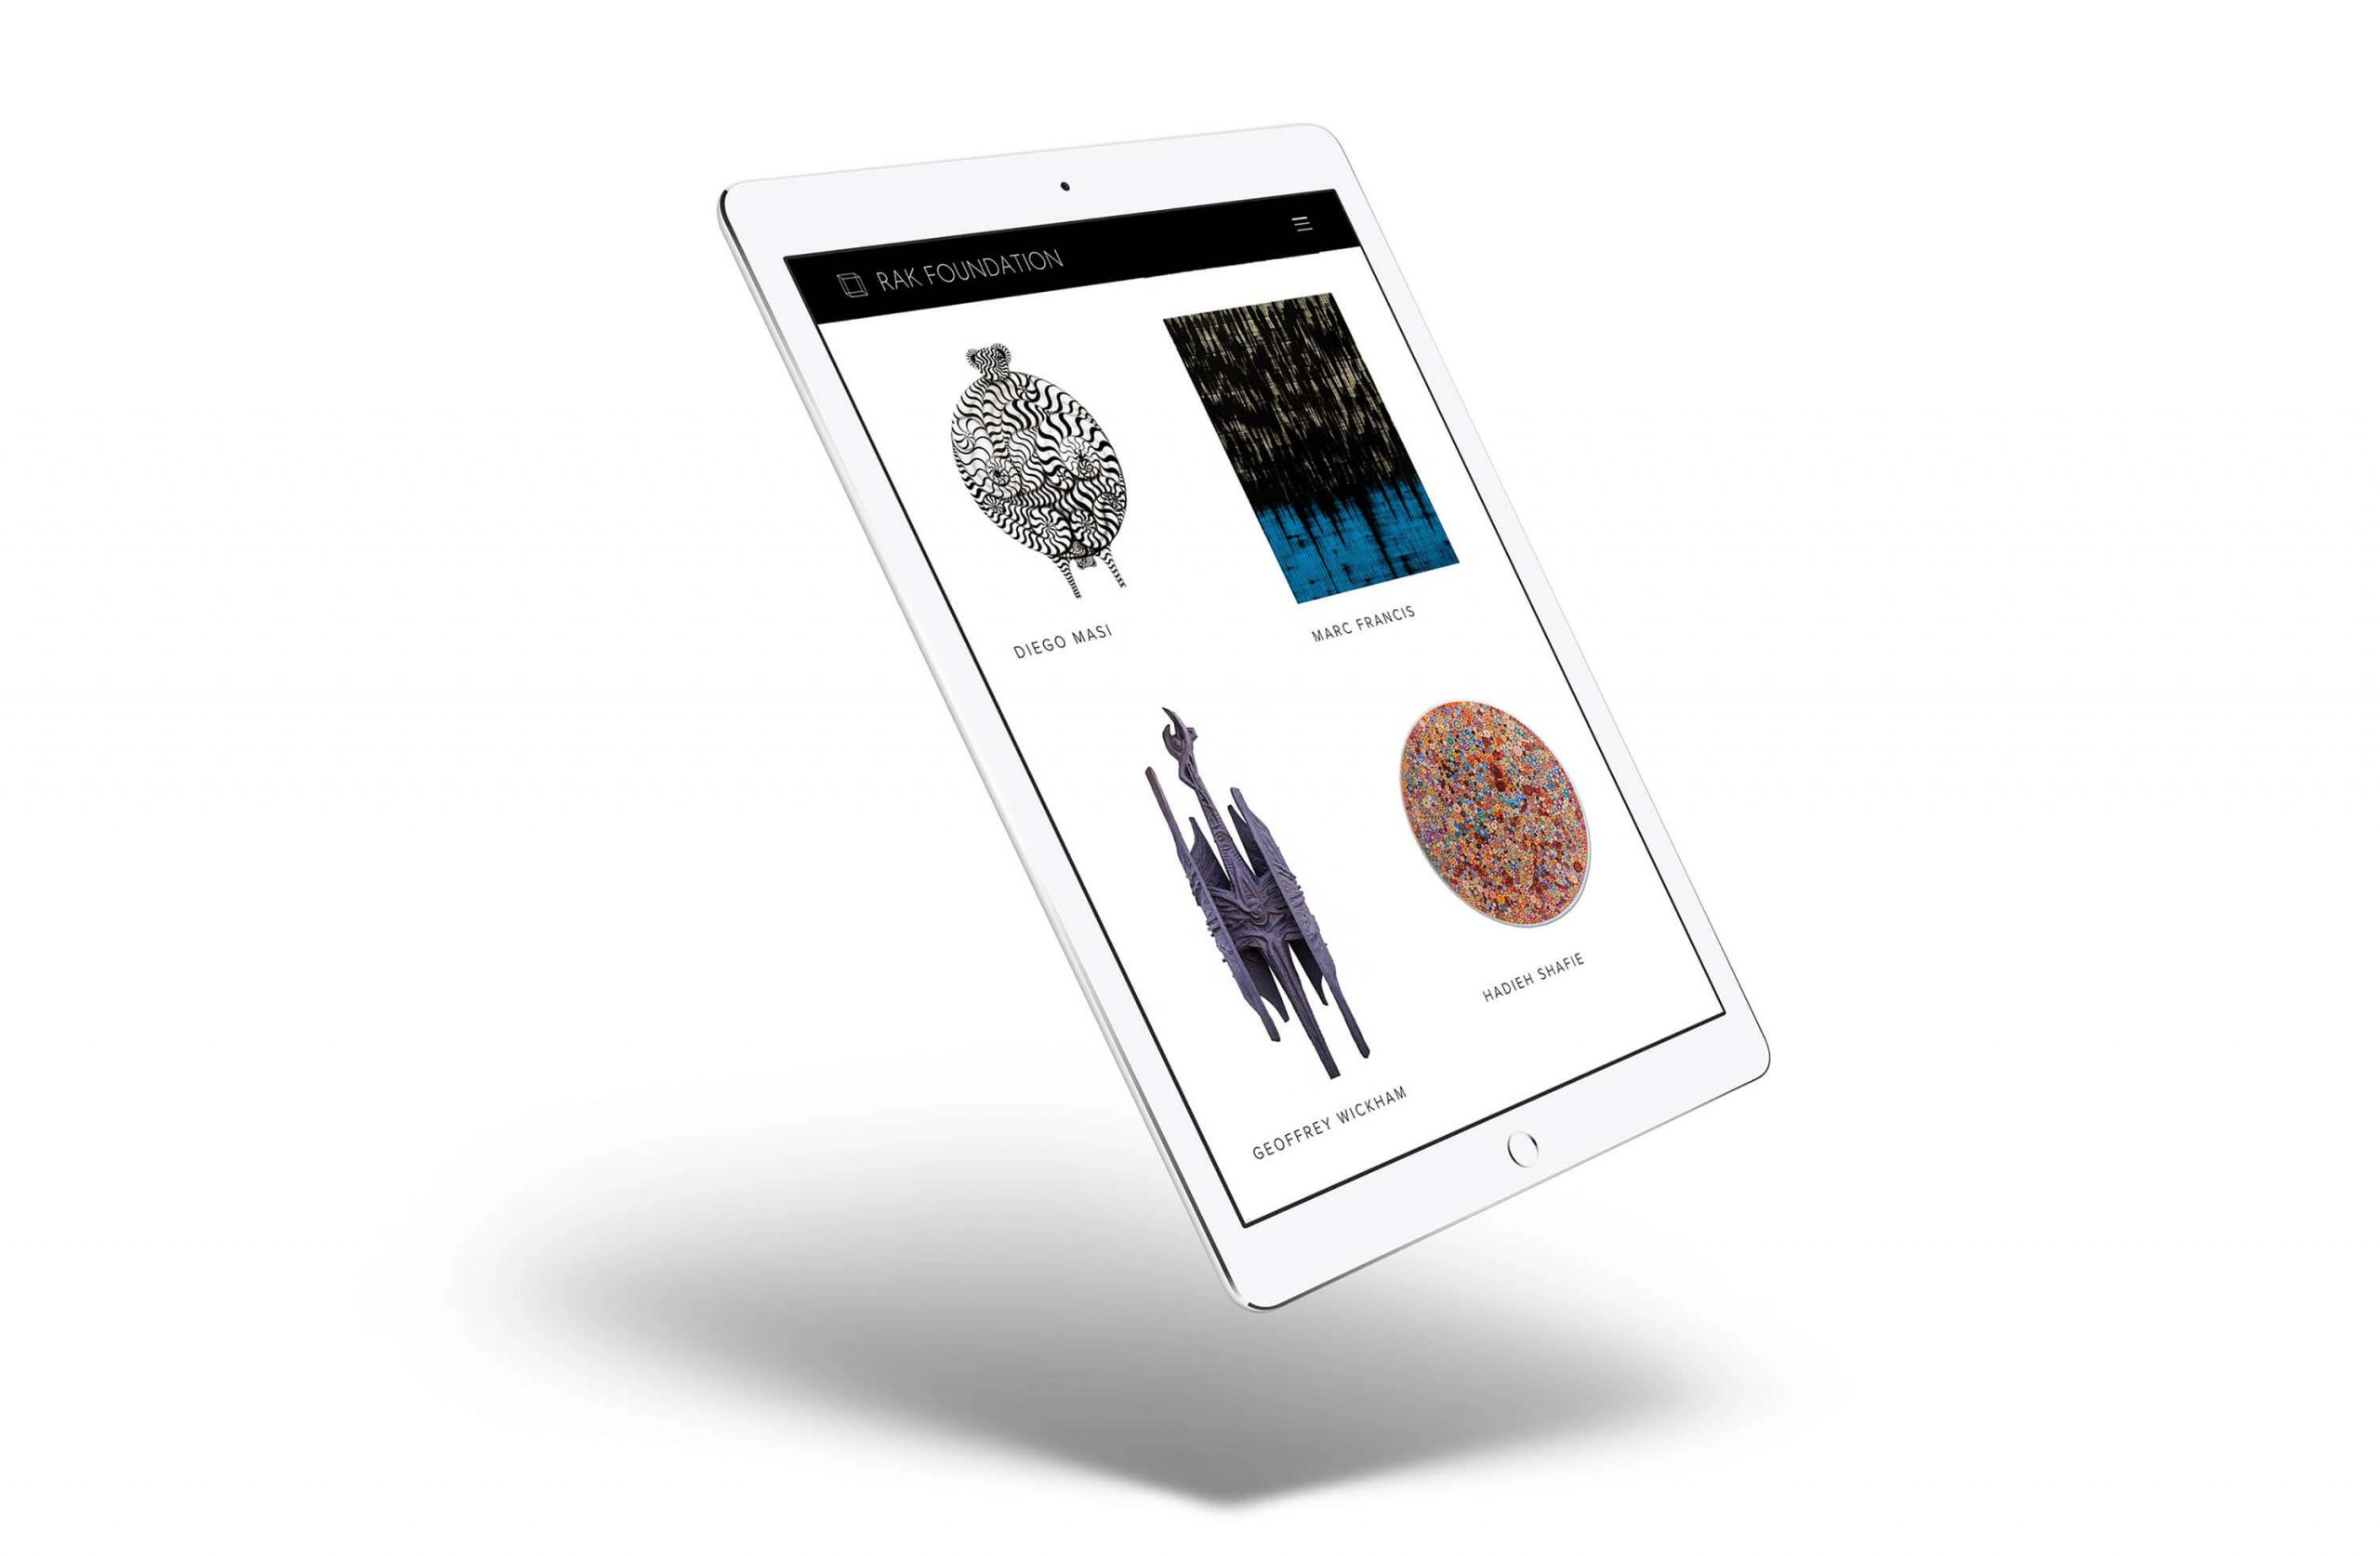 web design art collection tablet